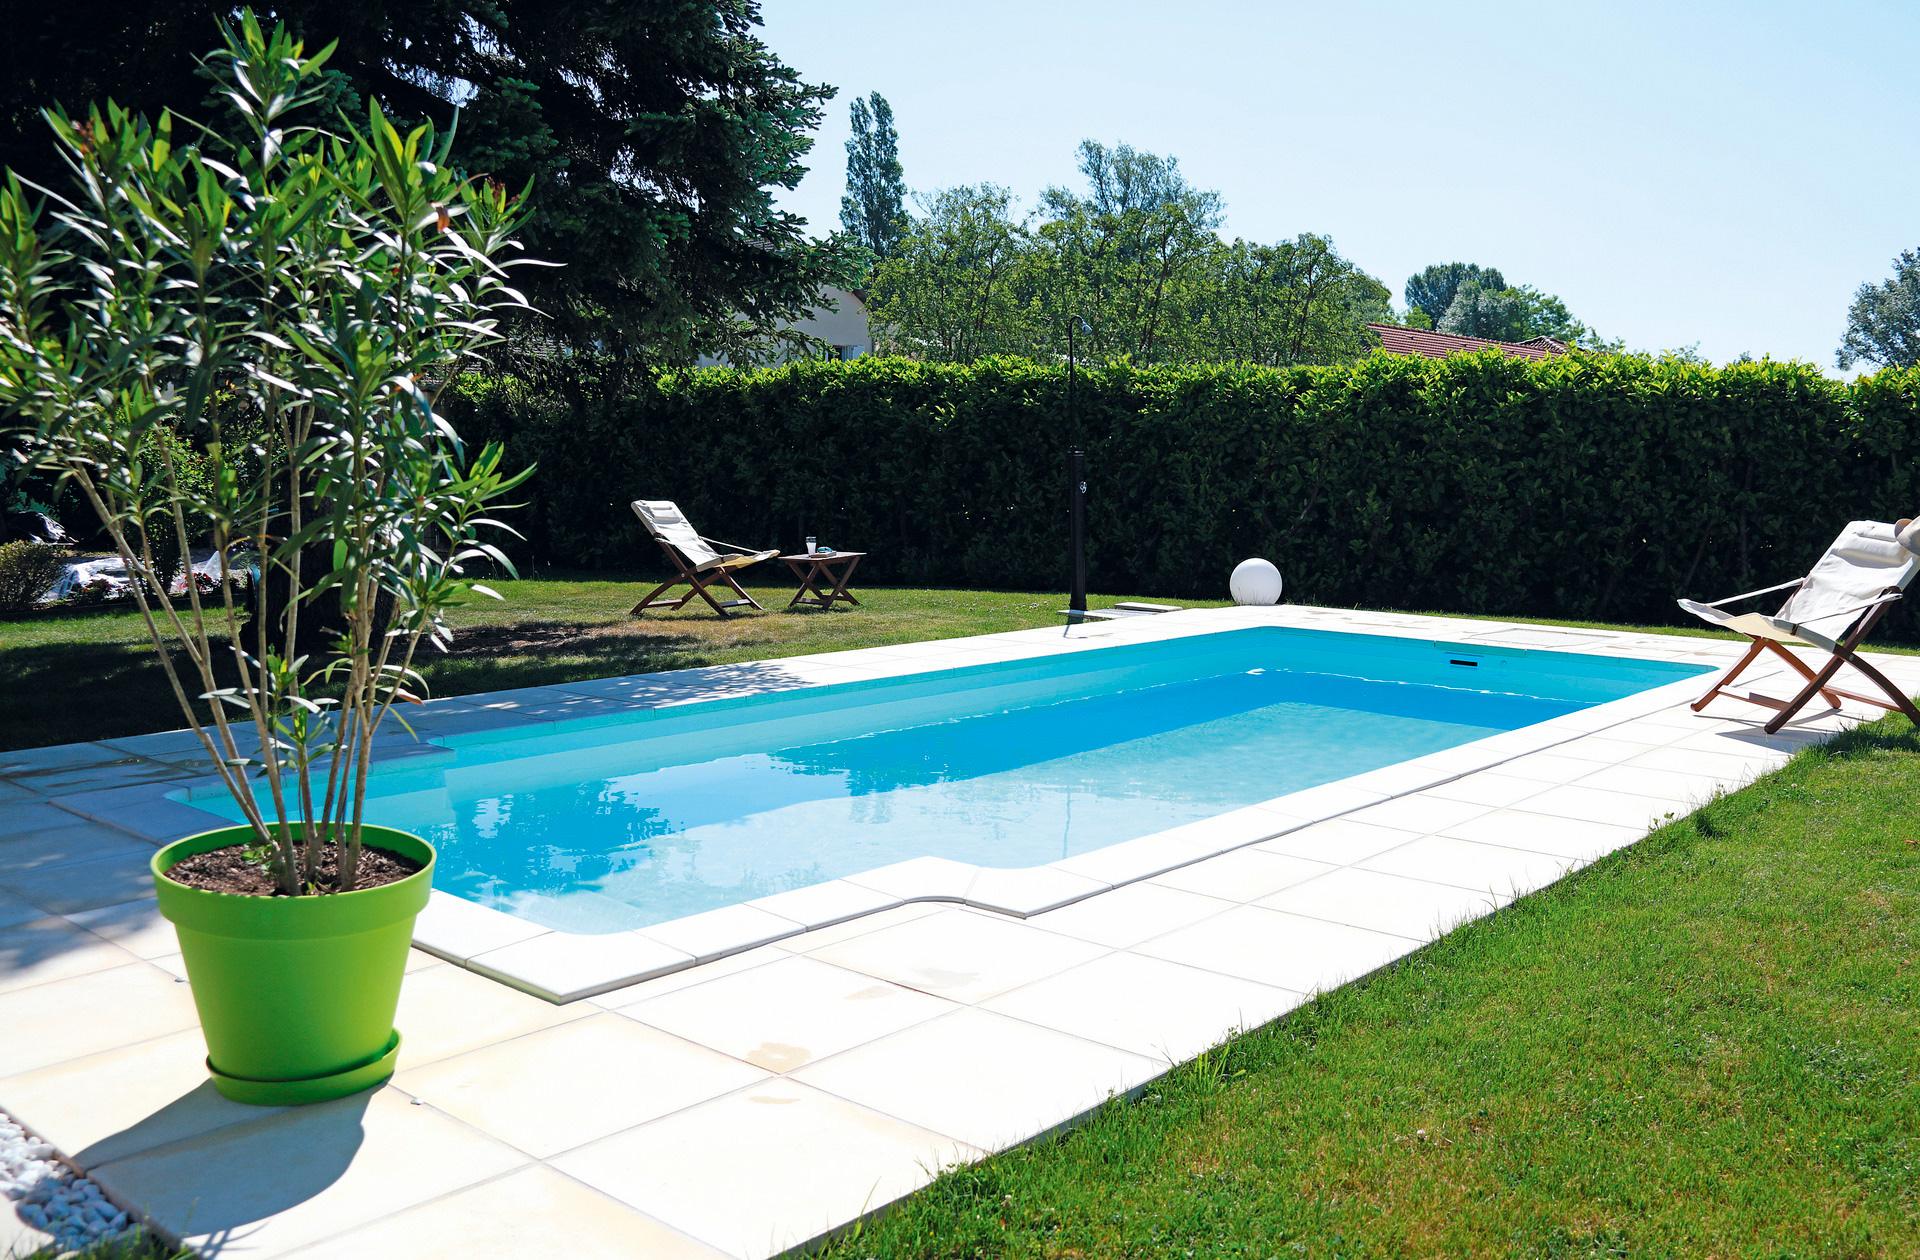 Gut bekannt Pool Bildgalerie: Swimmingpool Referenzen – Desjoyaux Pools EC44